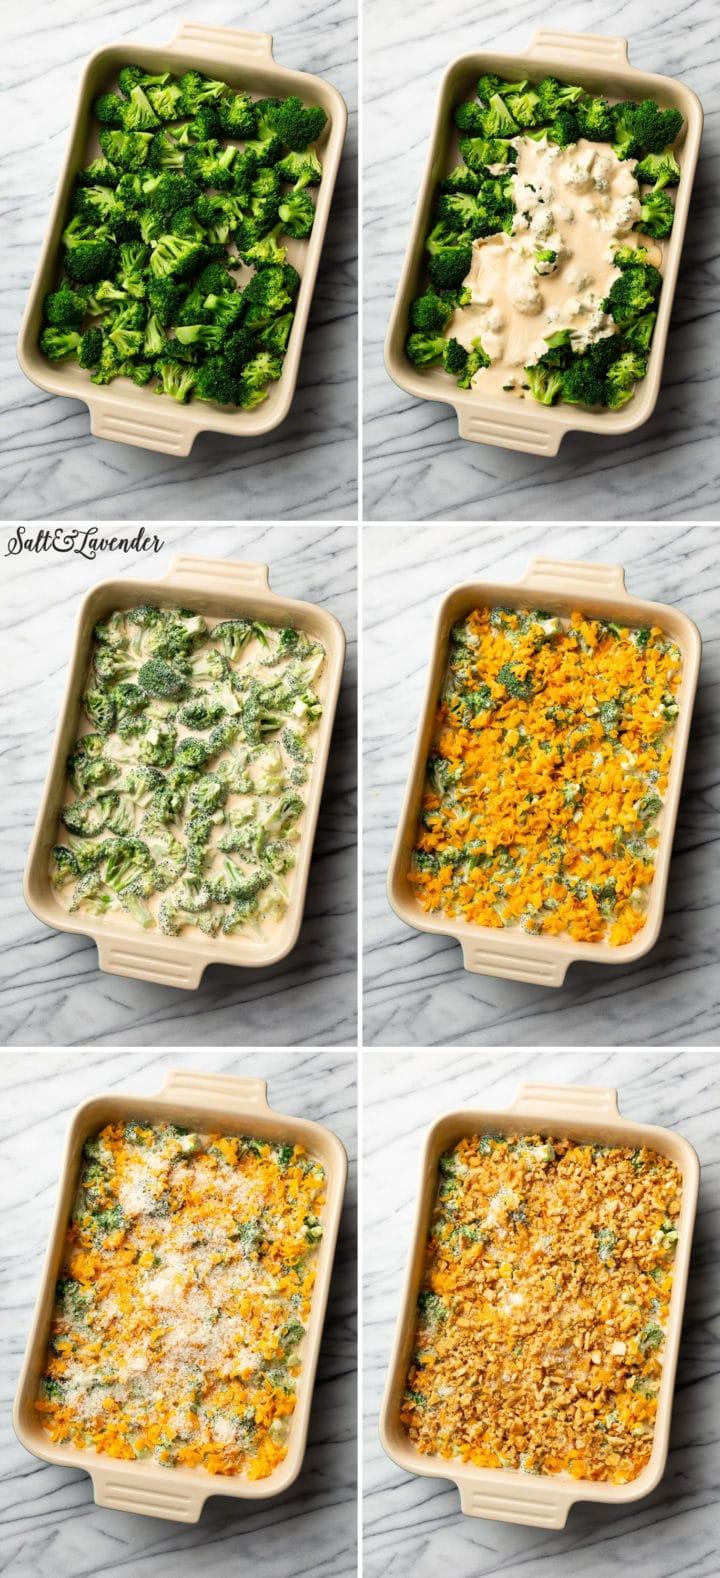 broccoli cheddar casserole process photo collage